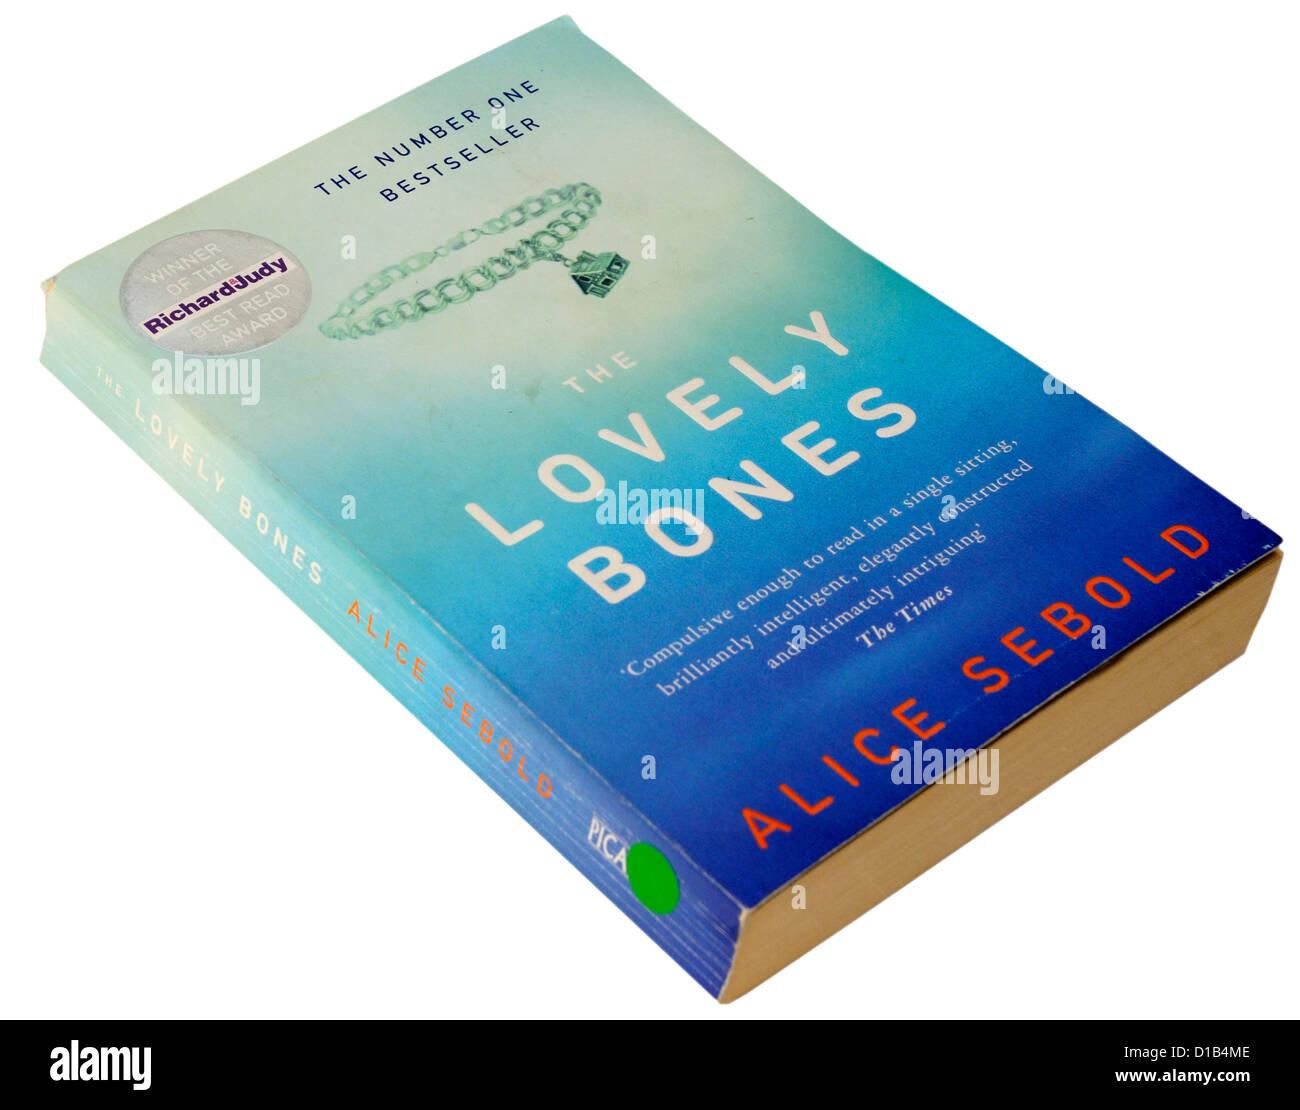 The Lovely Bones by Alice Sebold - Stock Image